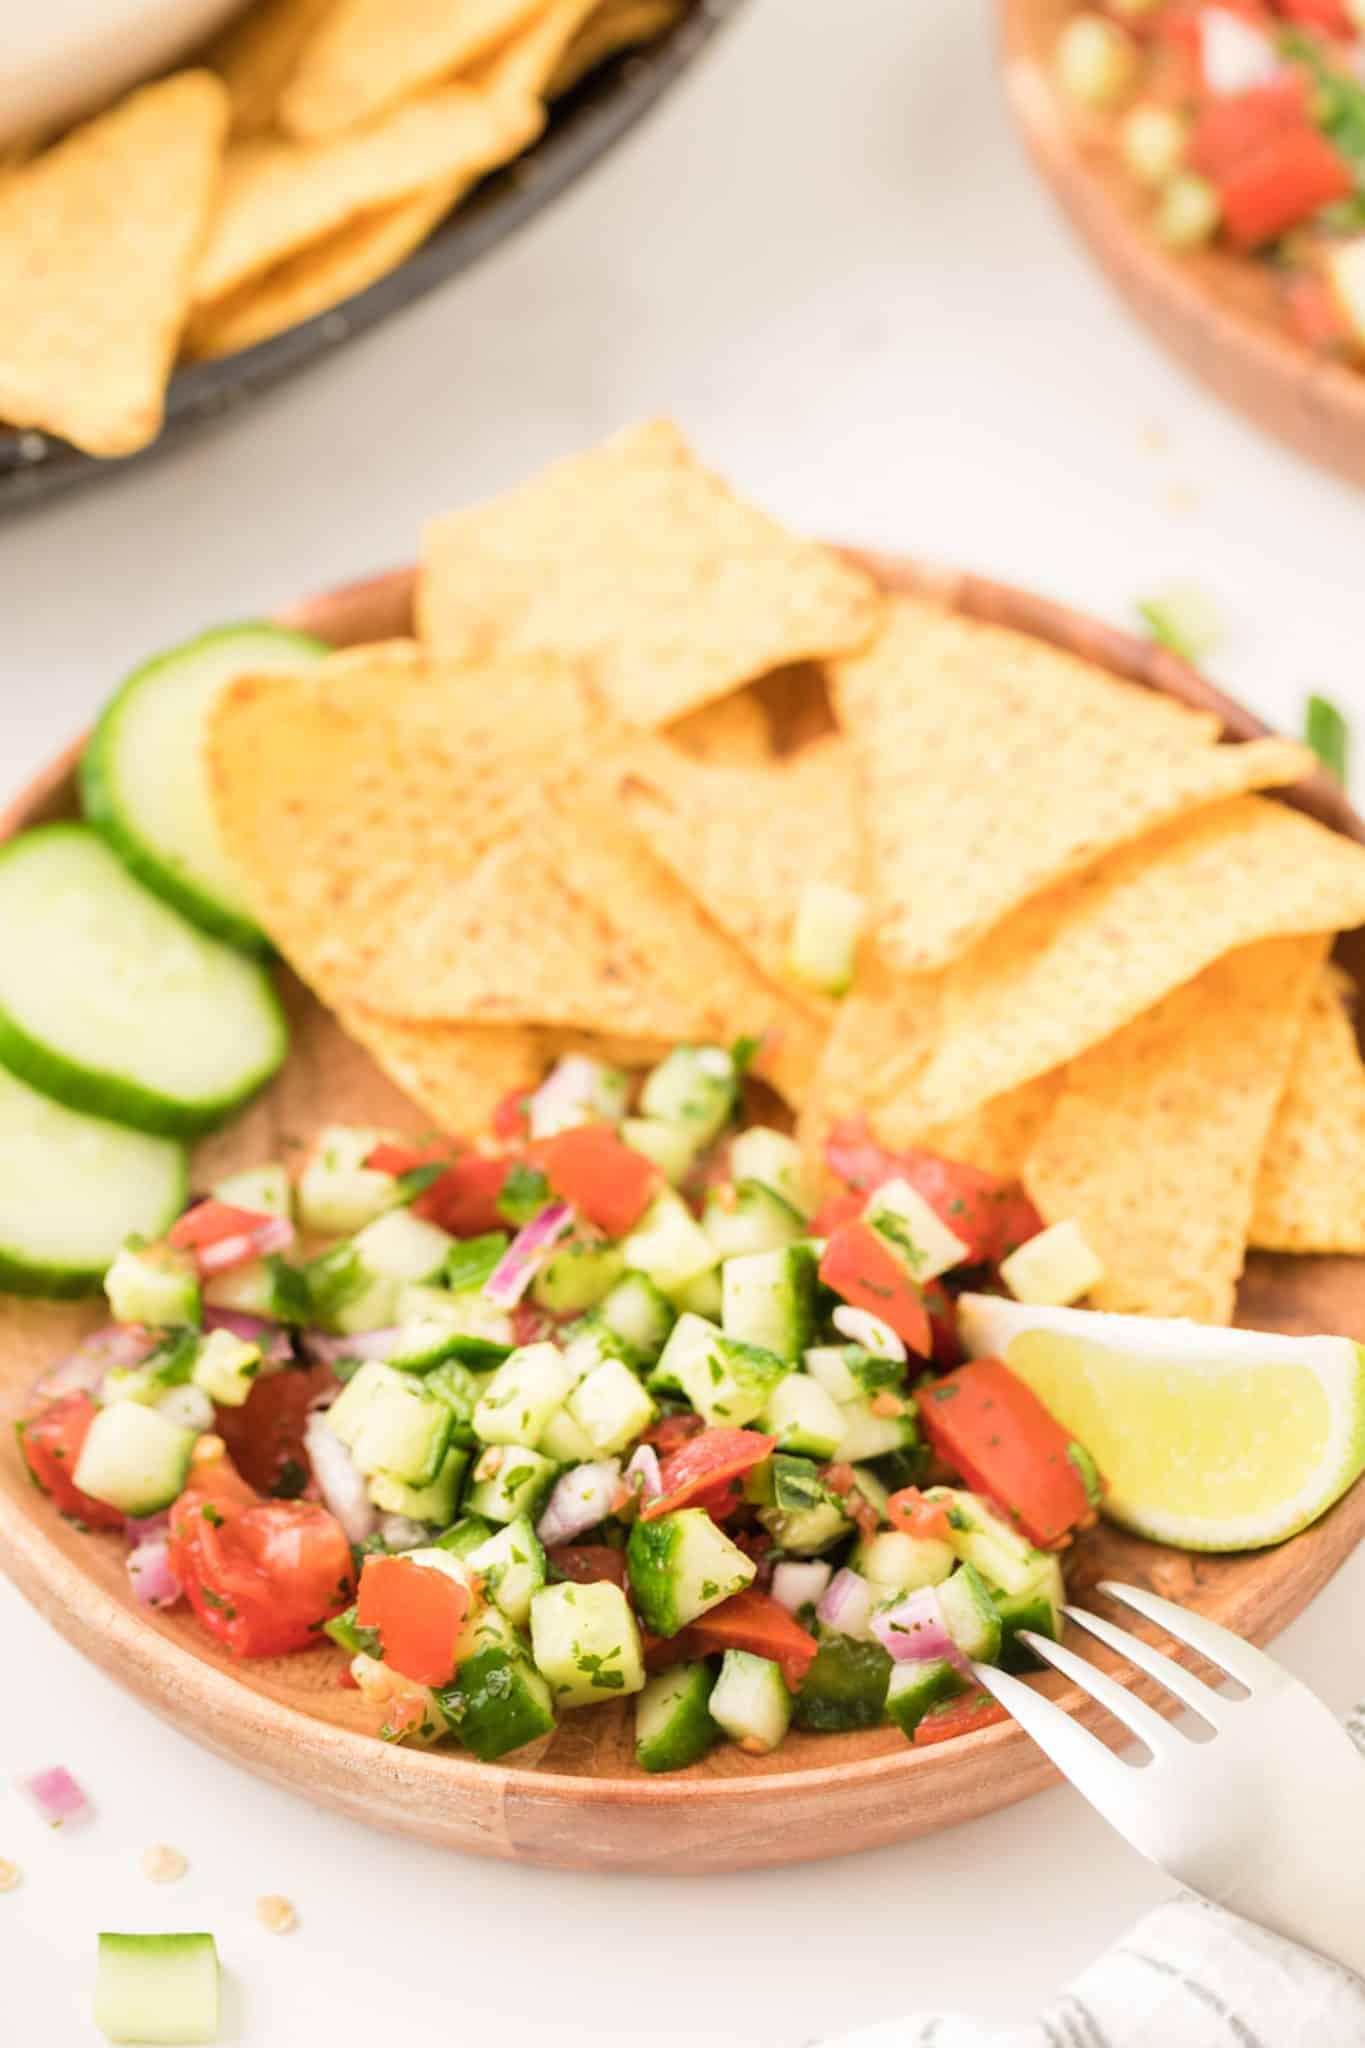 Cucumber pico de gallo with tortilla chips